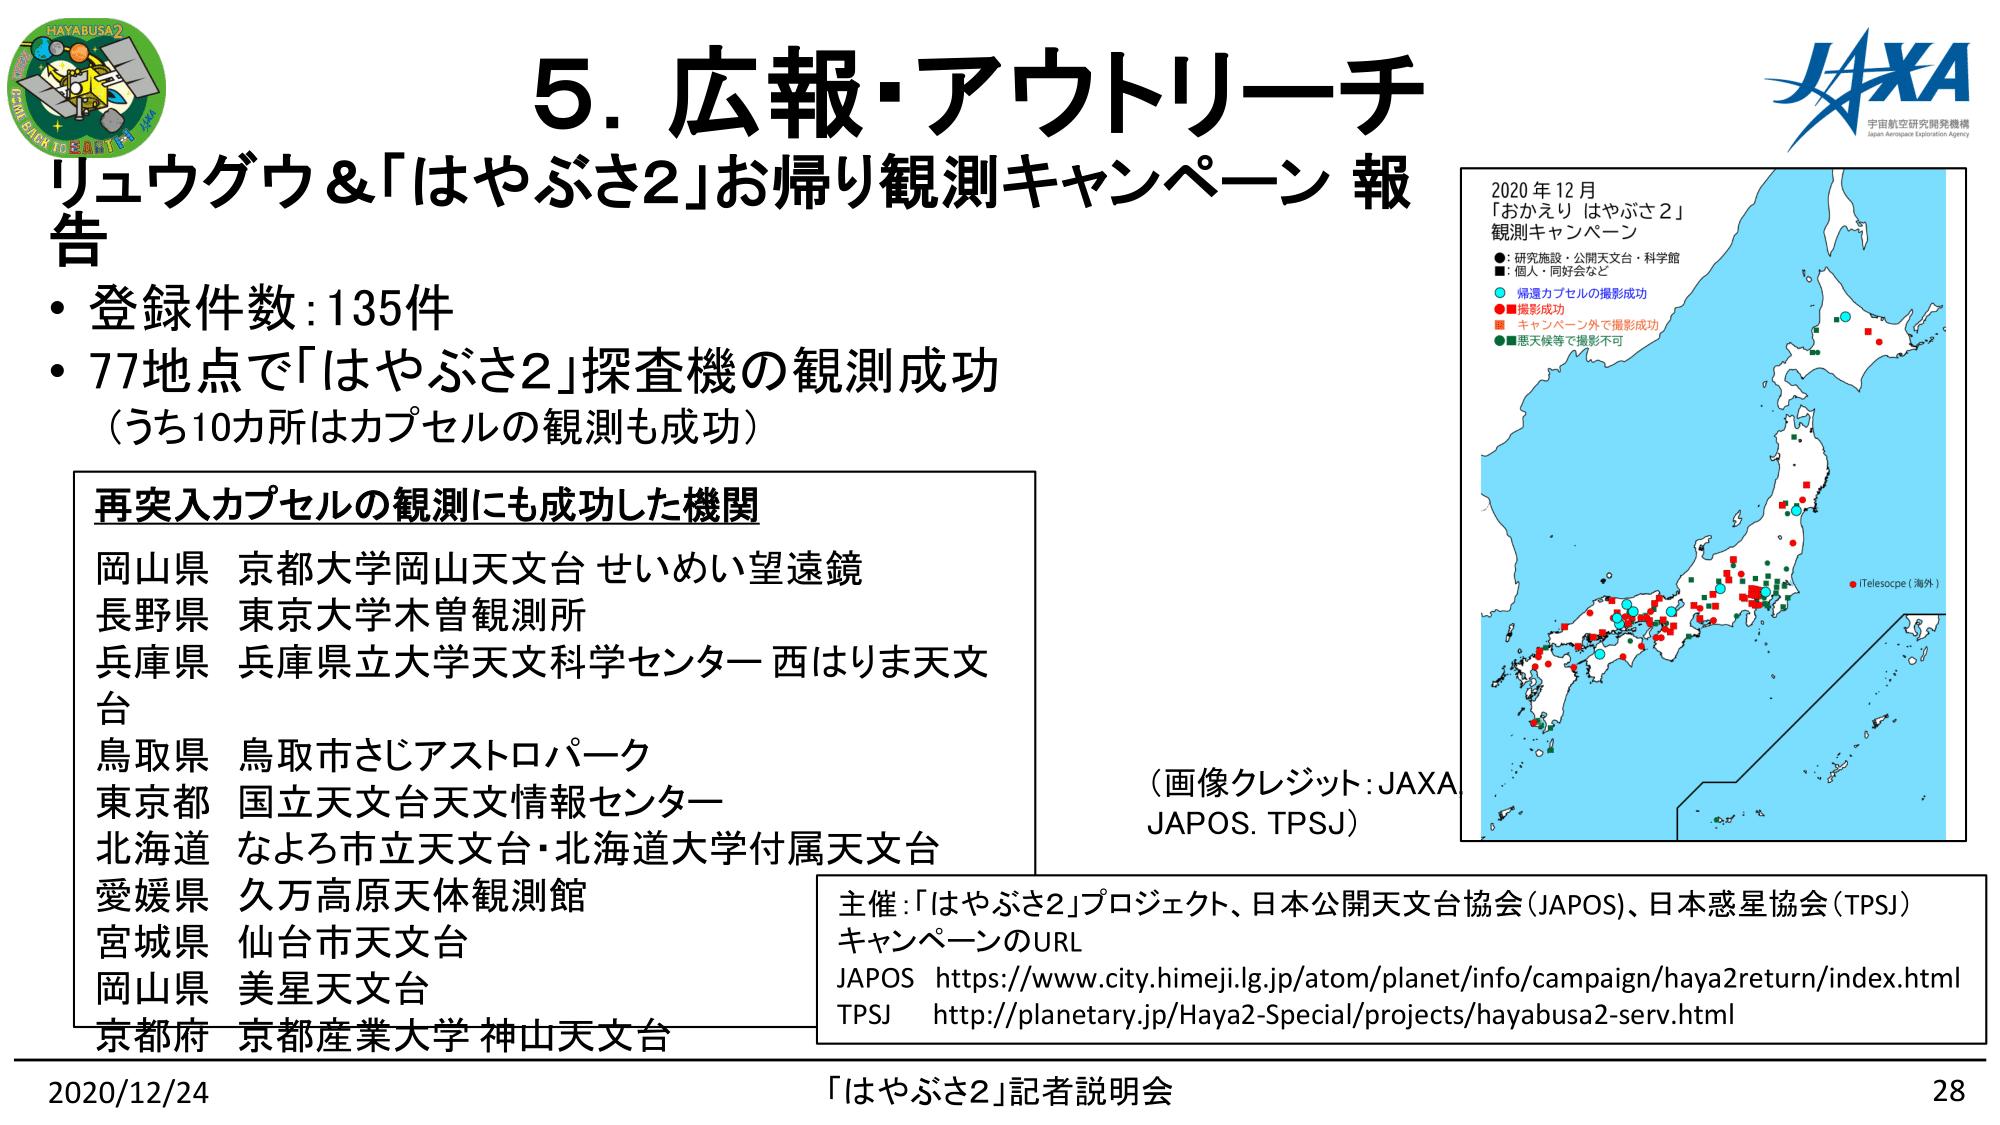 f:id:Imamura:20201224135312p:plain